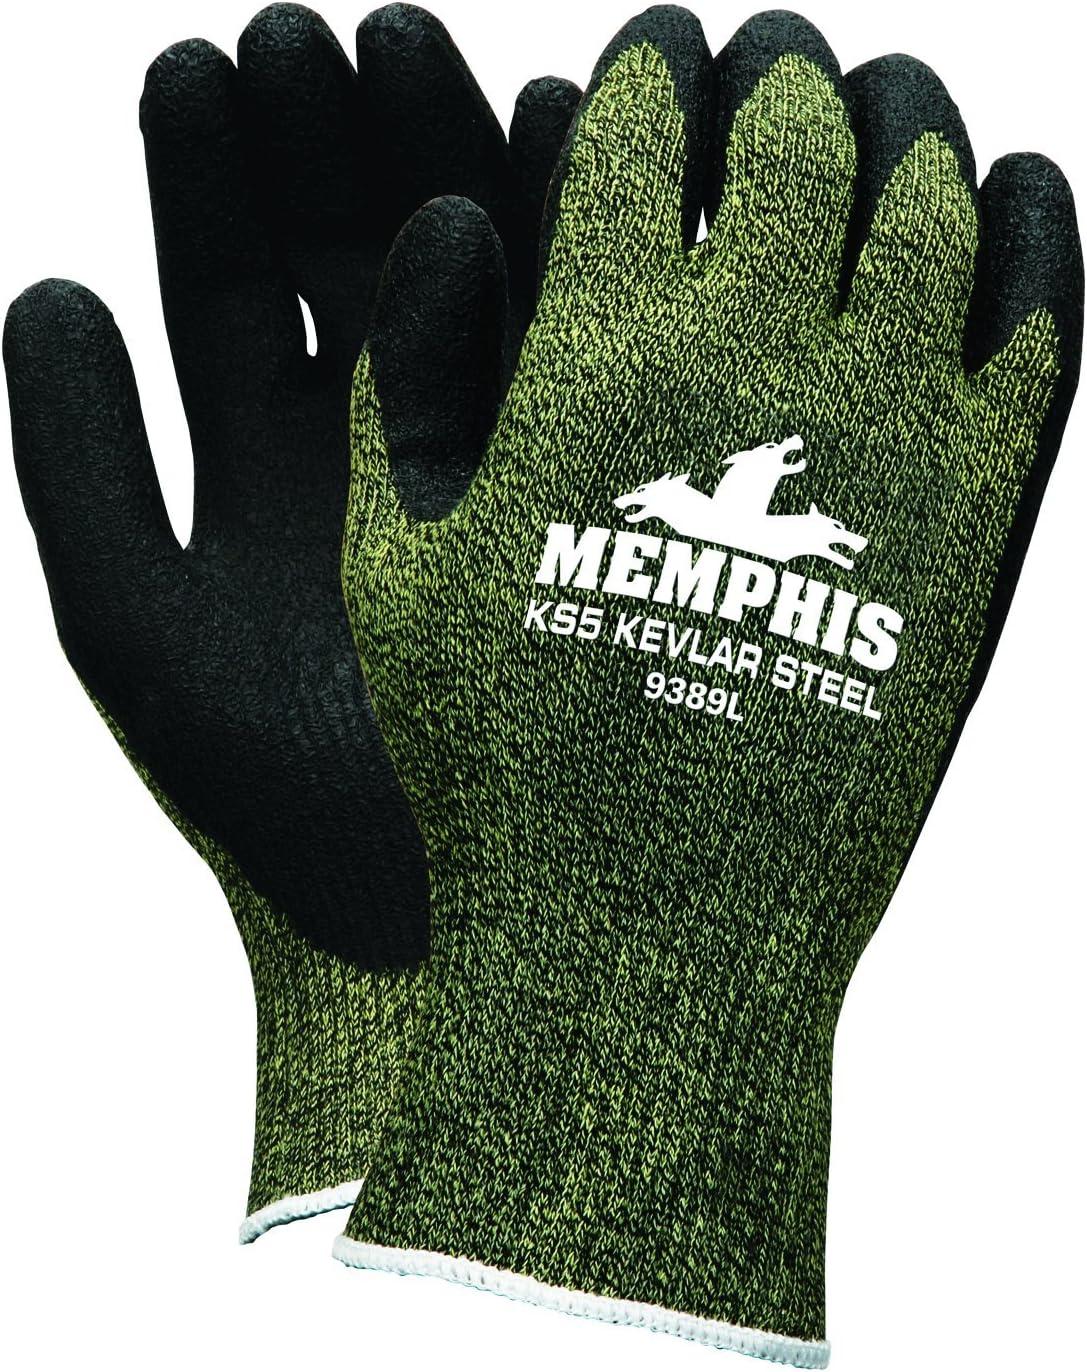 NWW09CUT 5 Pair Warrior Black PU Coated Cut D Size 10 Work Gloves